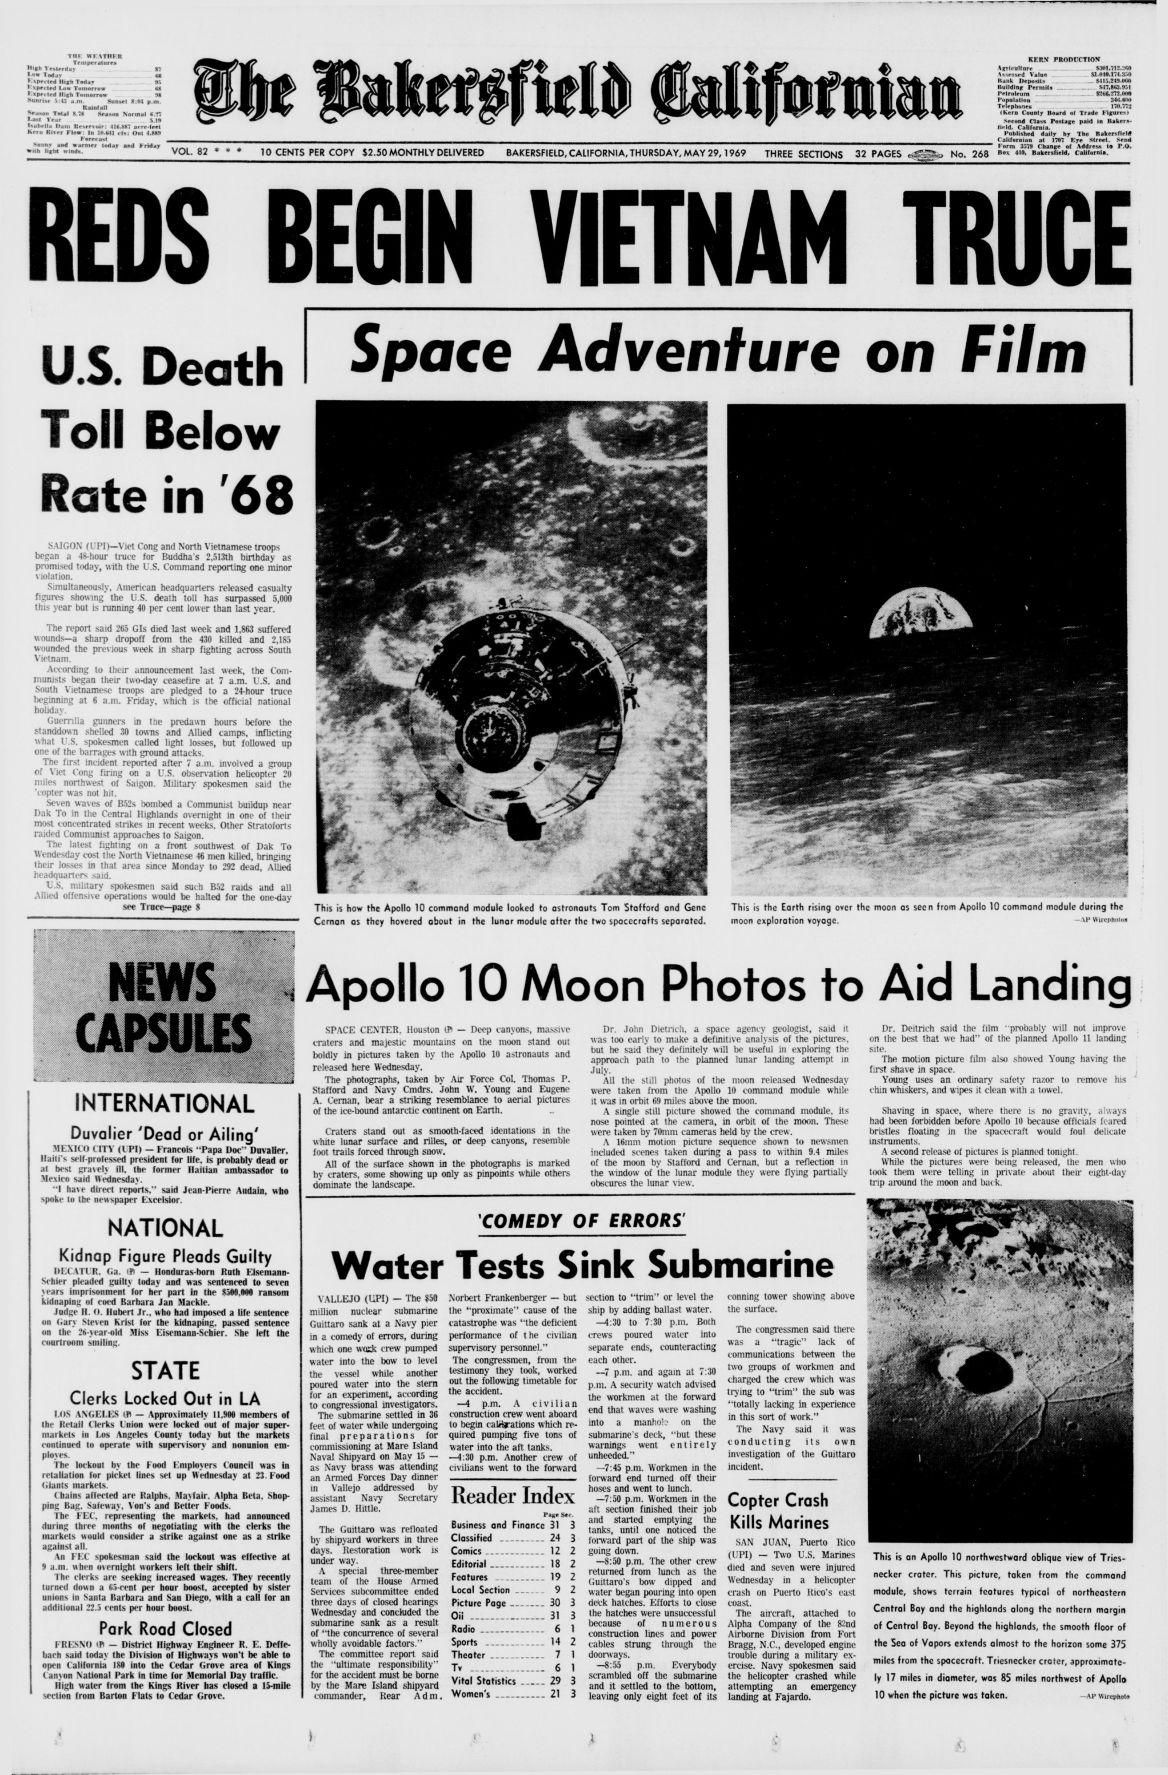 TBC Time Capsule: May 29, 1969